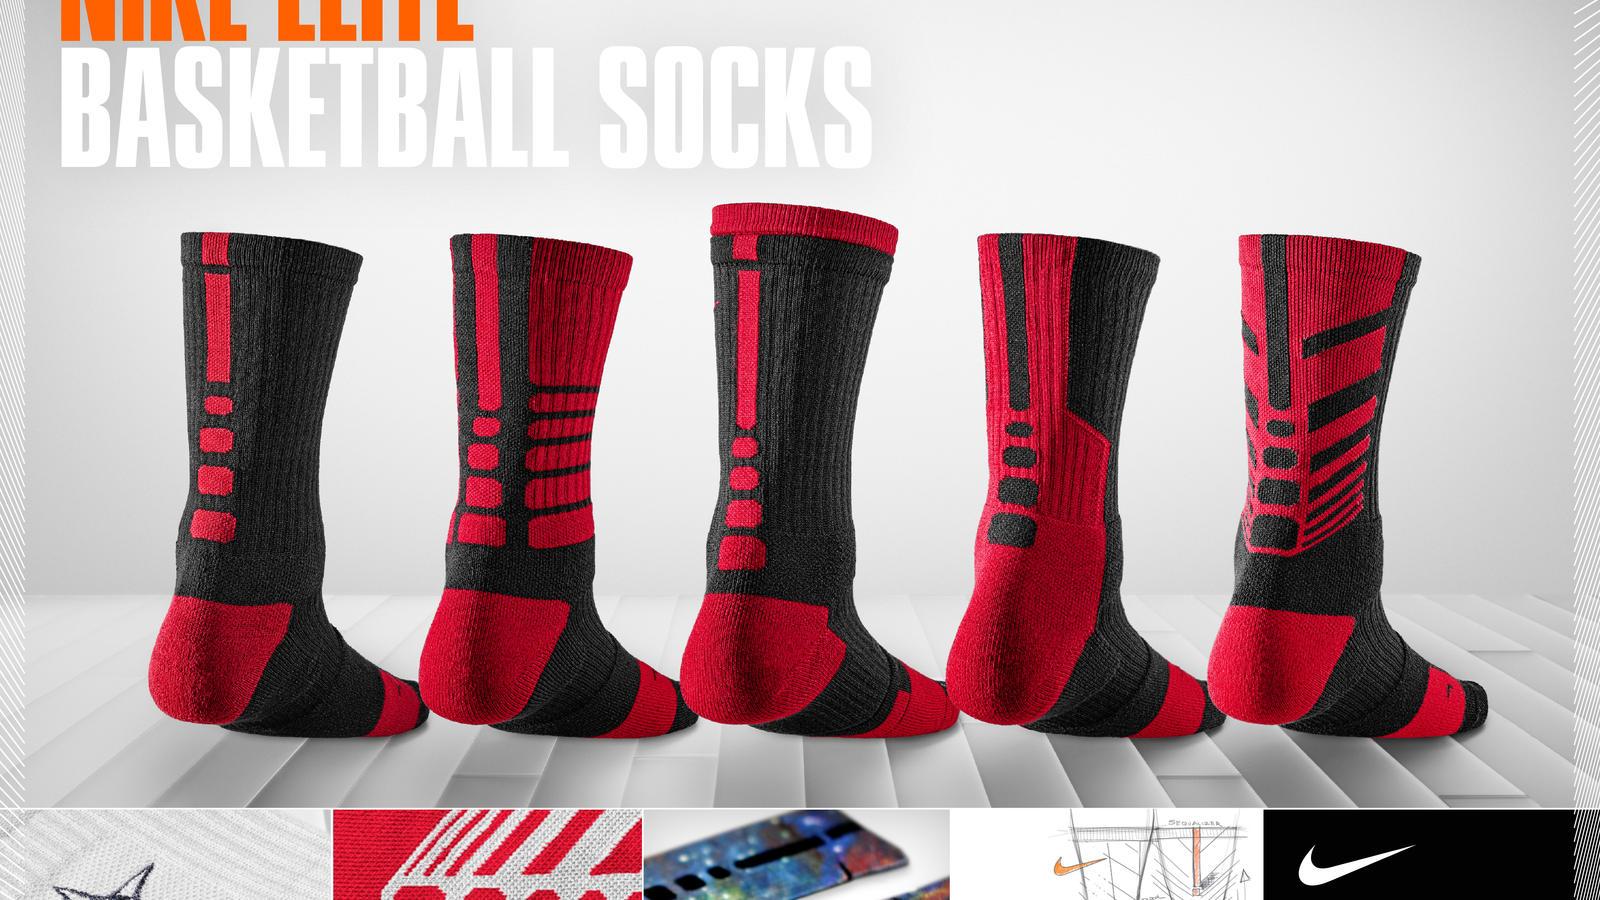 Nike Calcetines De Baloncesto De Élite envío libre confiable jBmzB